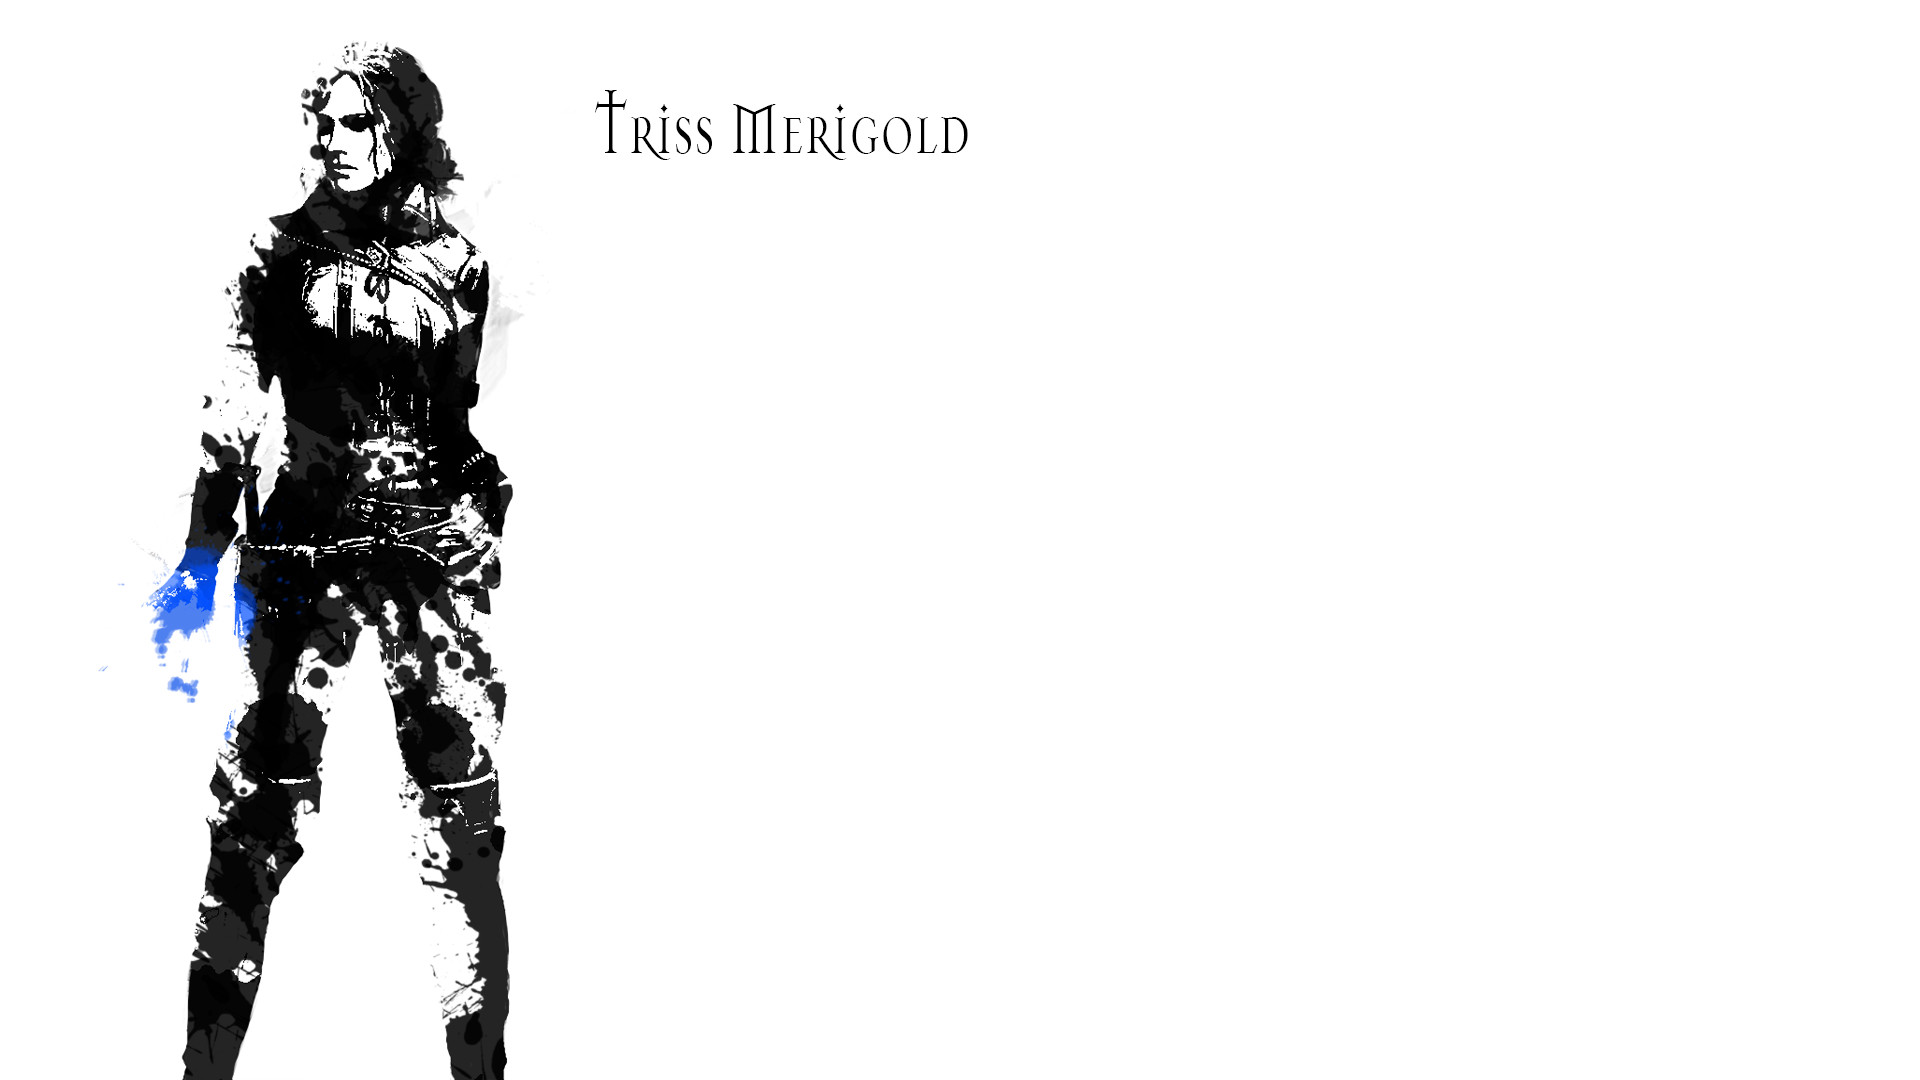 Triss Merigold by JacobGwynbleiid Triss Merigold by JacobGwynbleiid